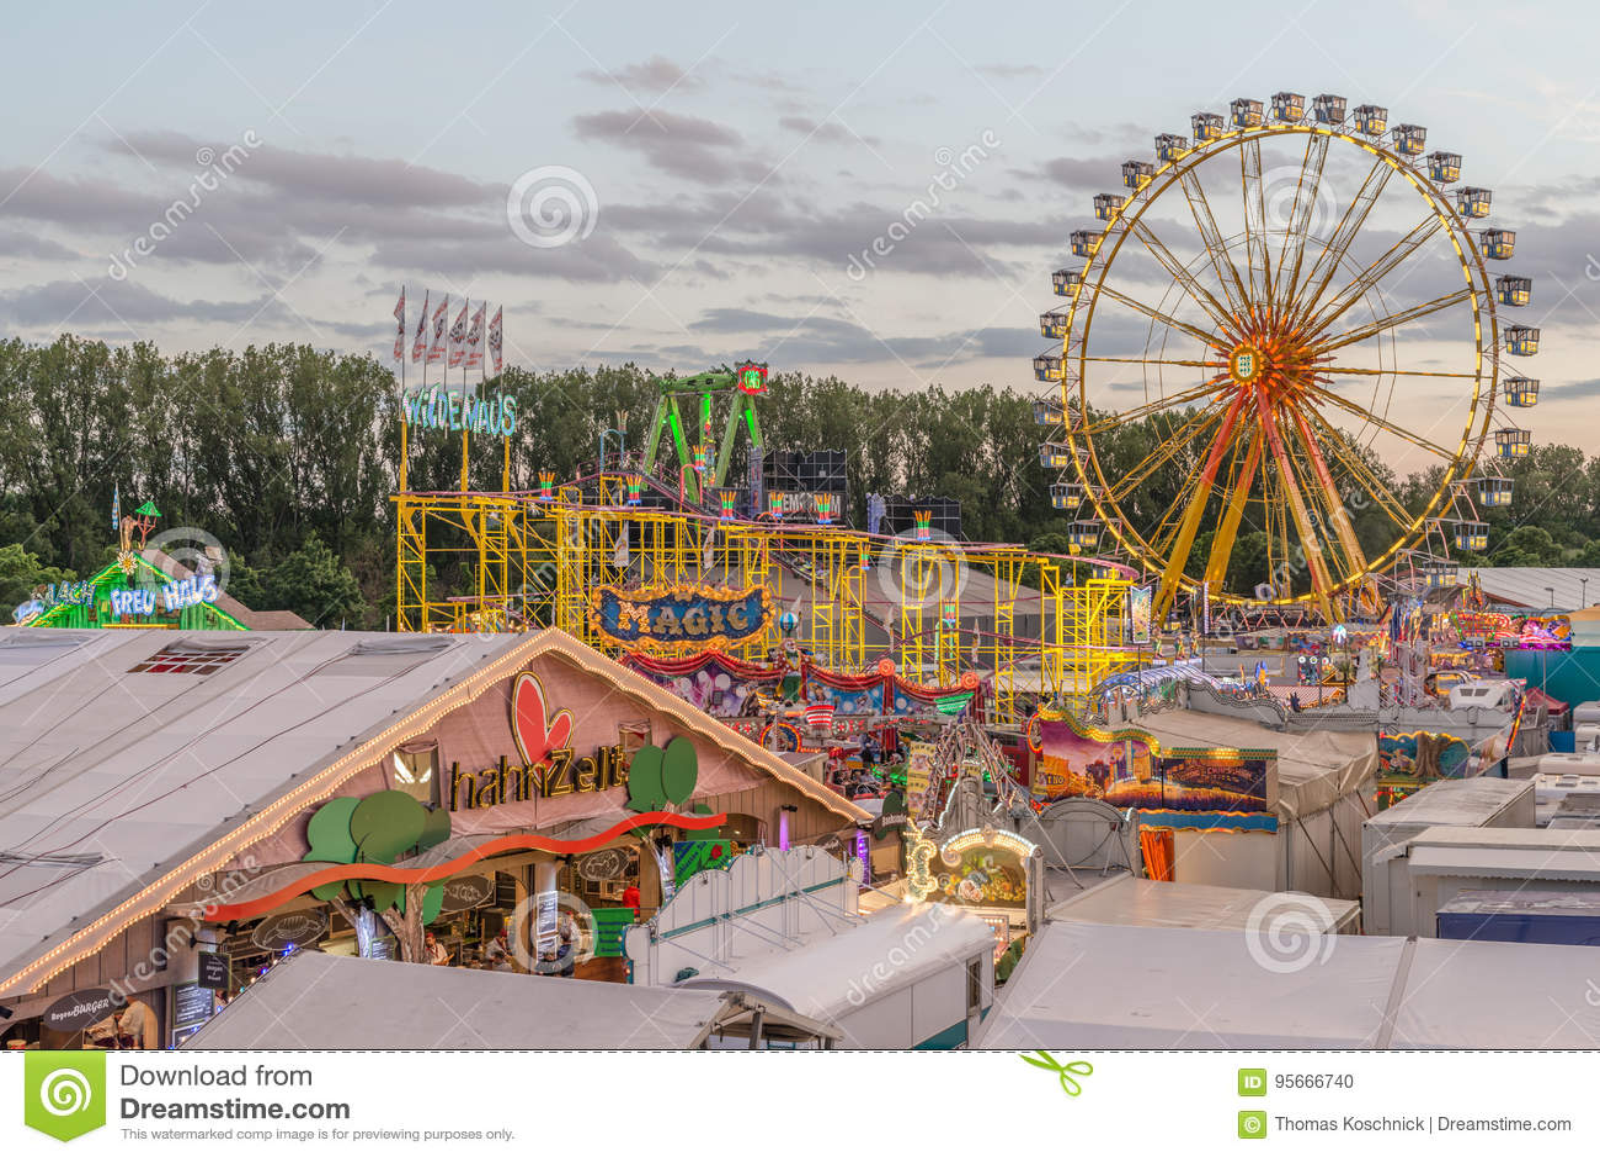 Folk festival in Regensburg with beer tent joyride and ferris wheel